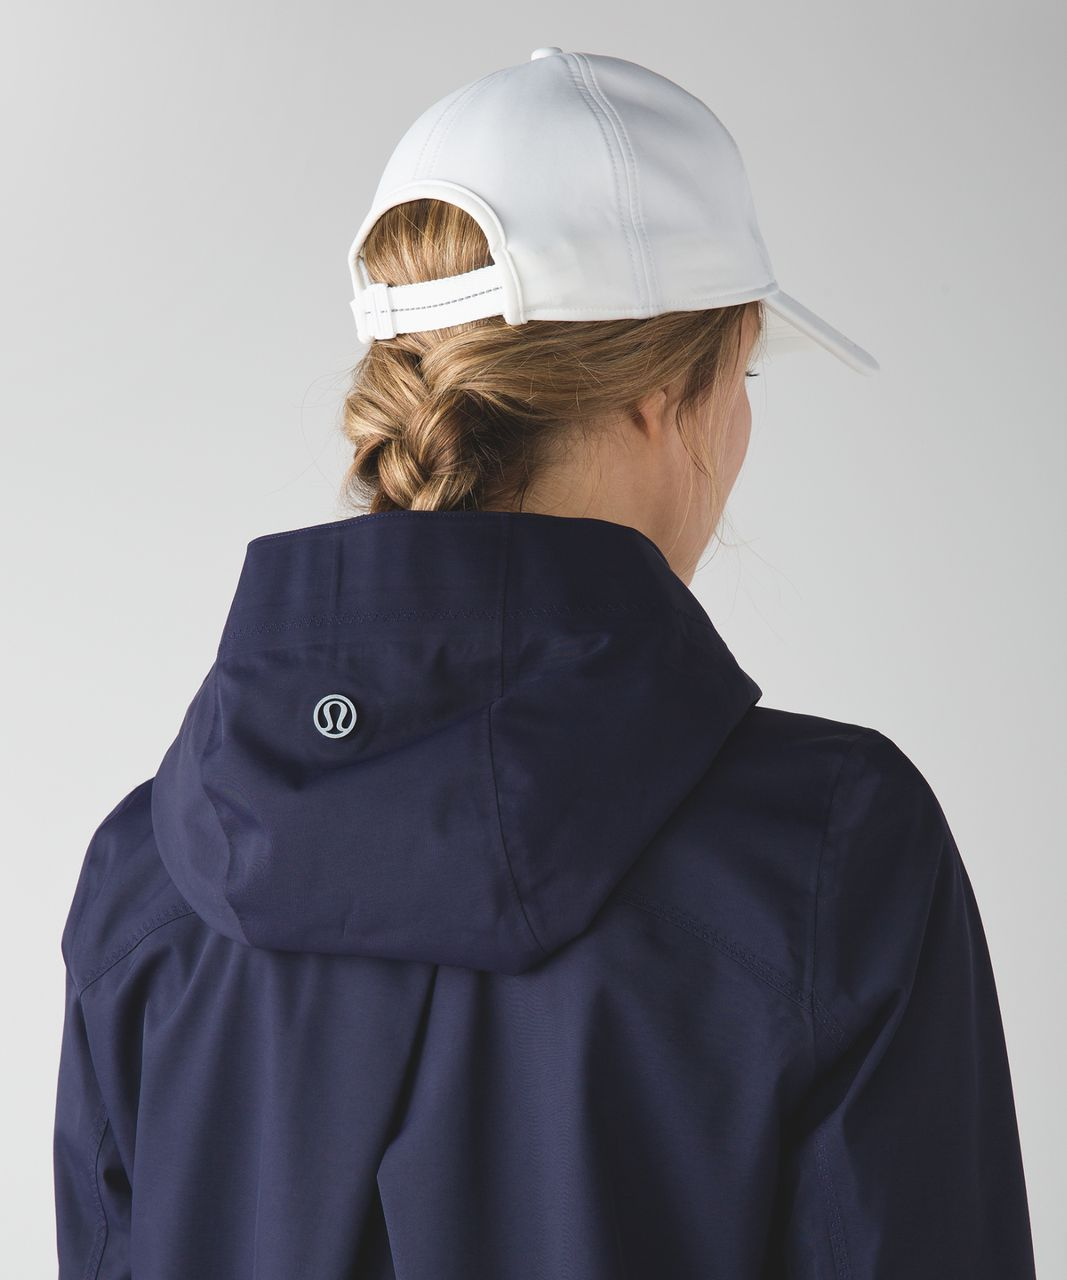 Lululemon Savasana Waterproof Jacket II - Deep Indigo